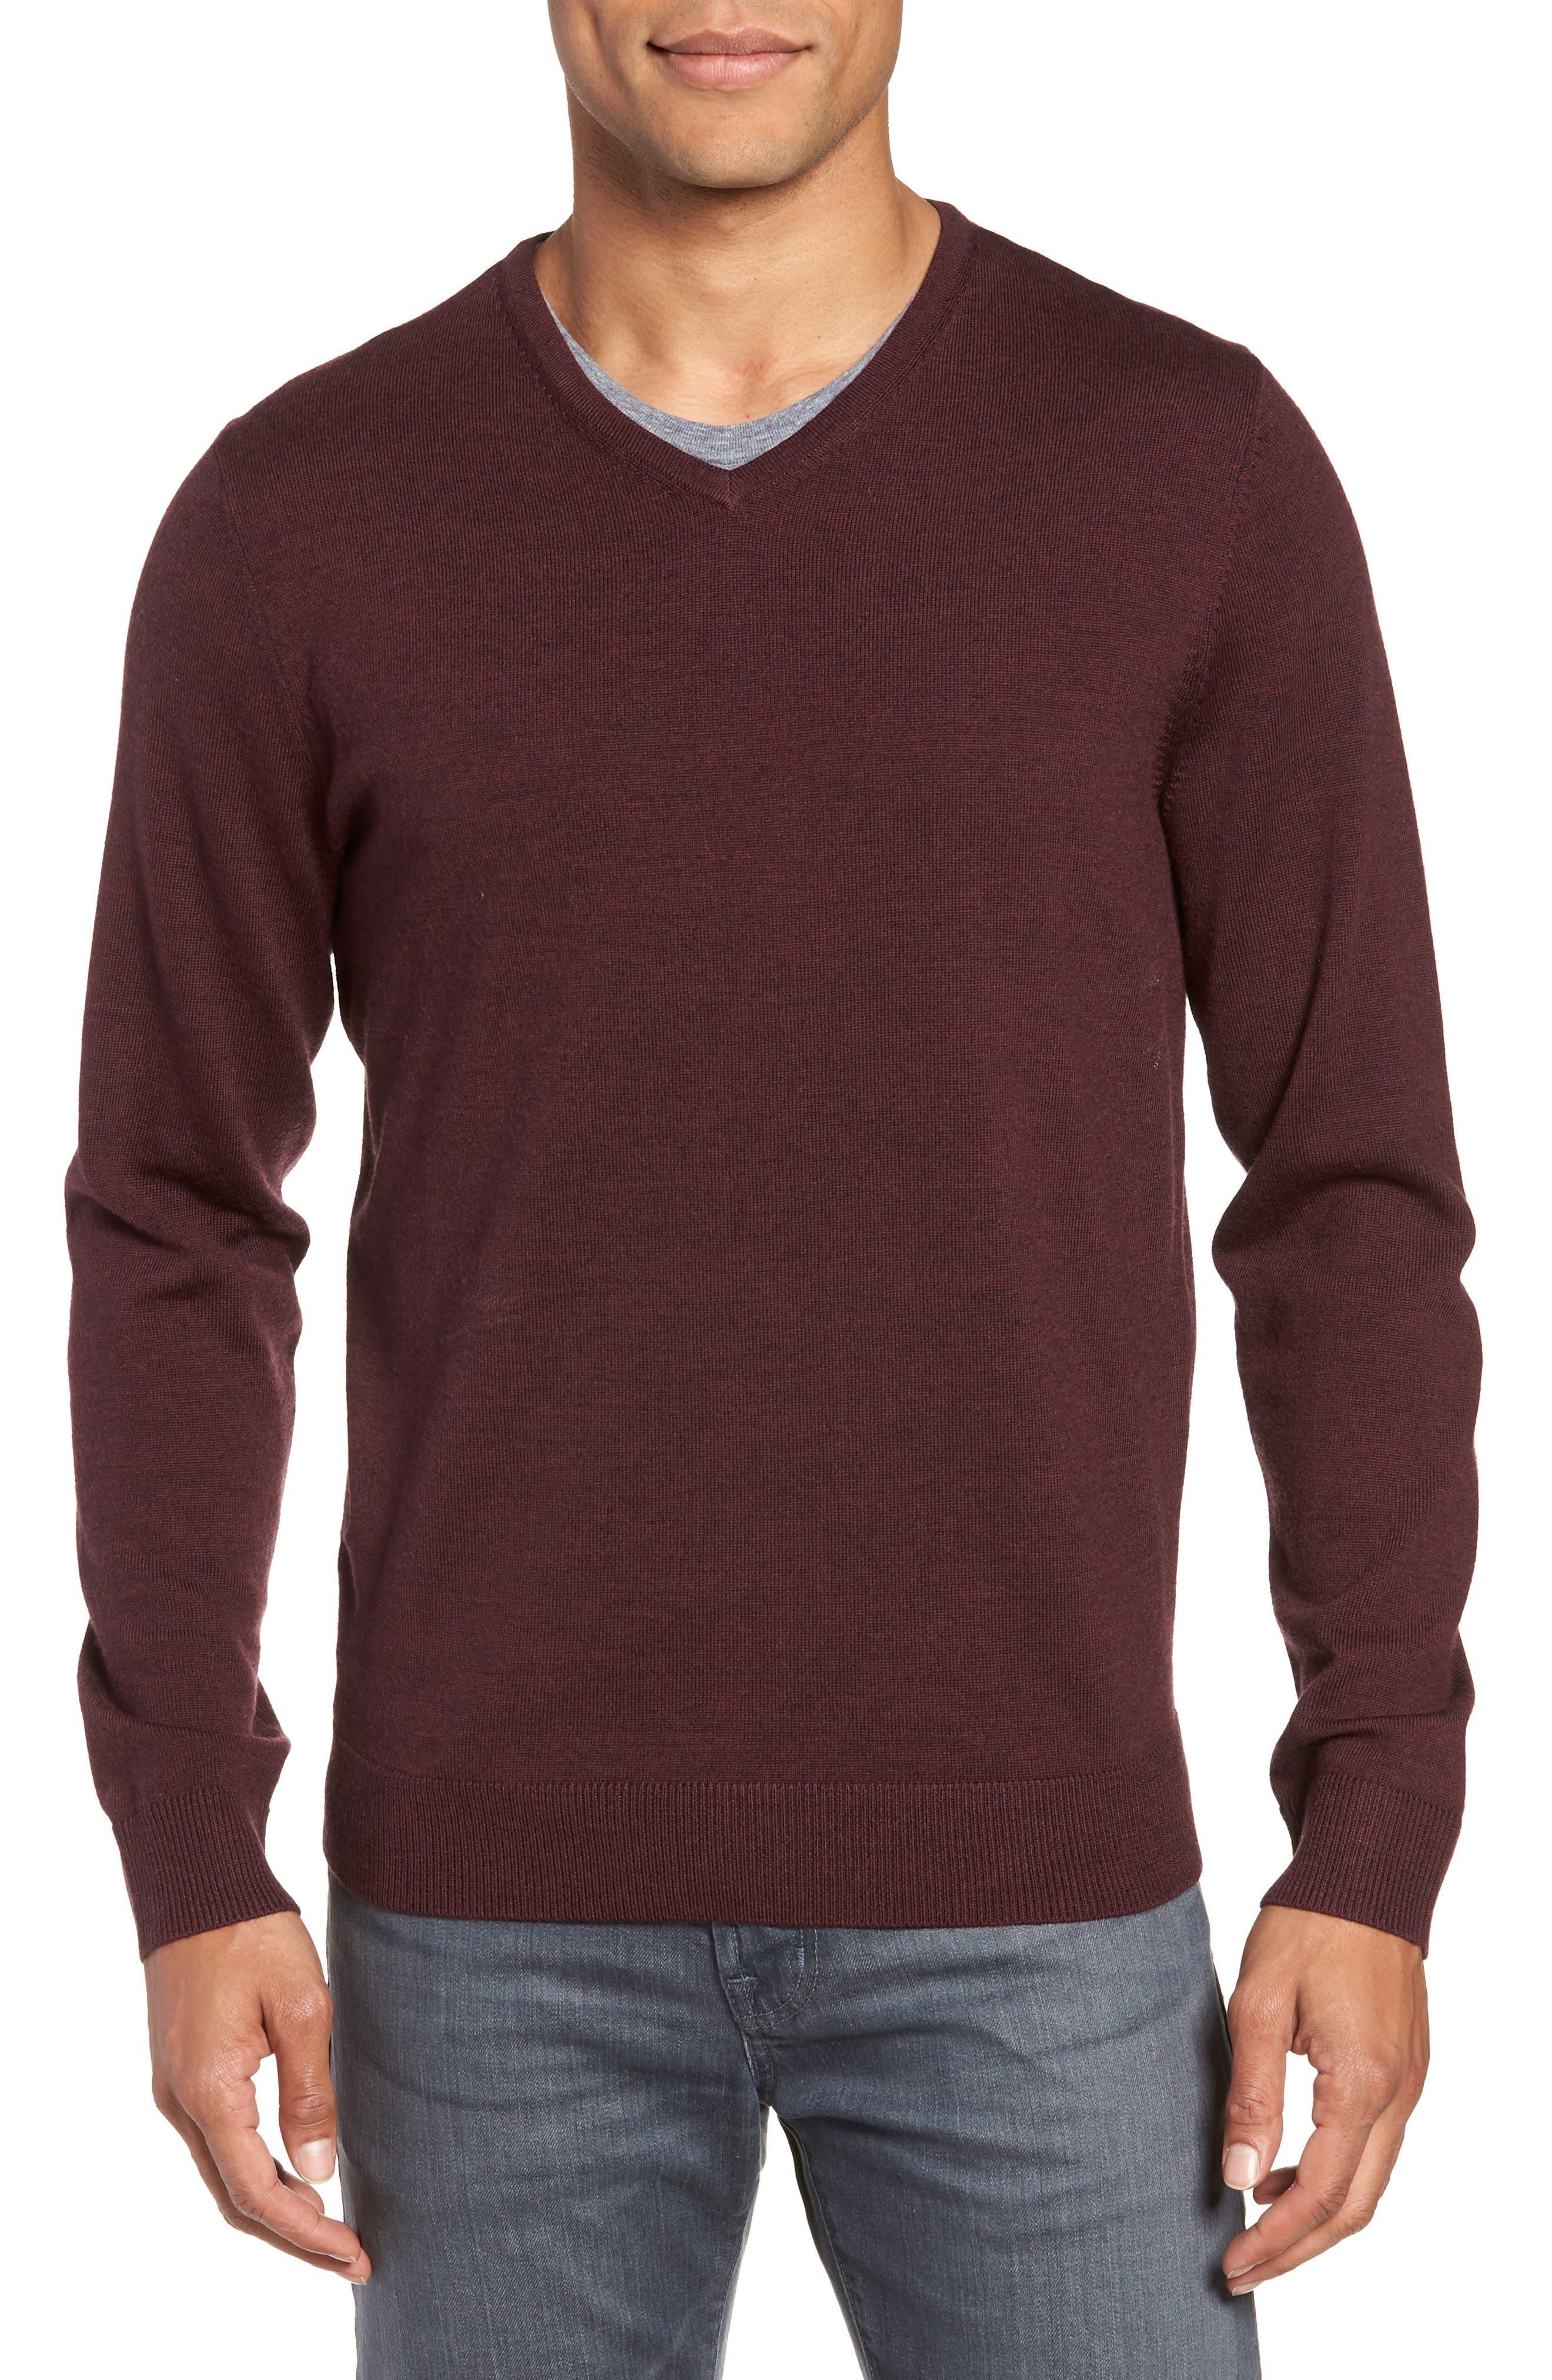 Nordstrom Shop Washable Merino Wool V-Neck Sweater, Burgundy